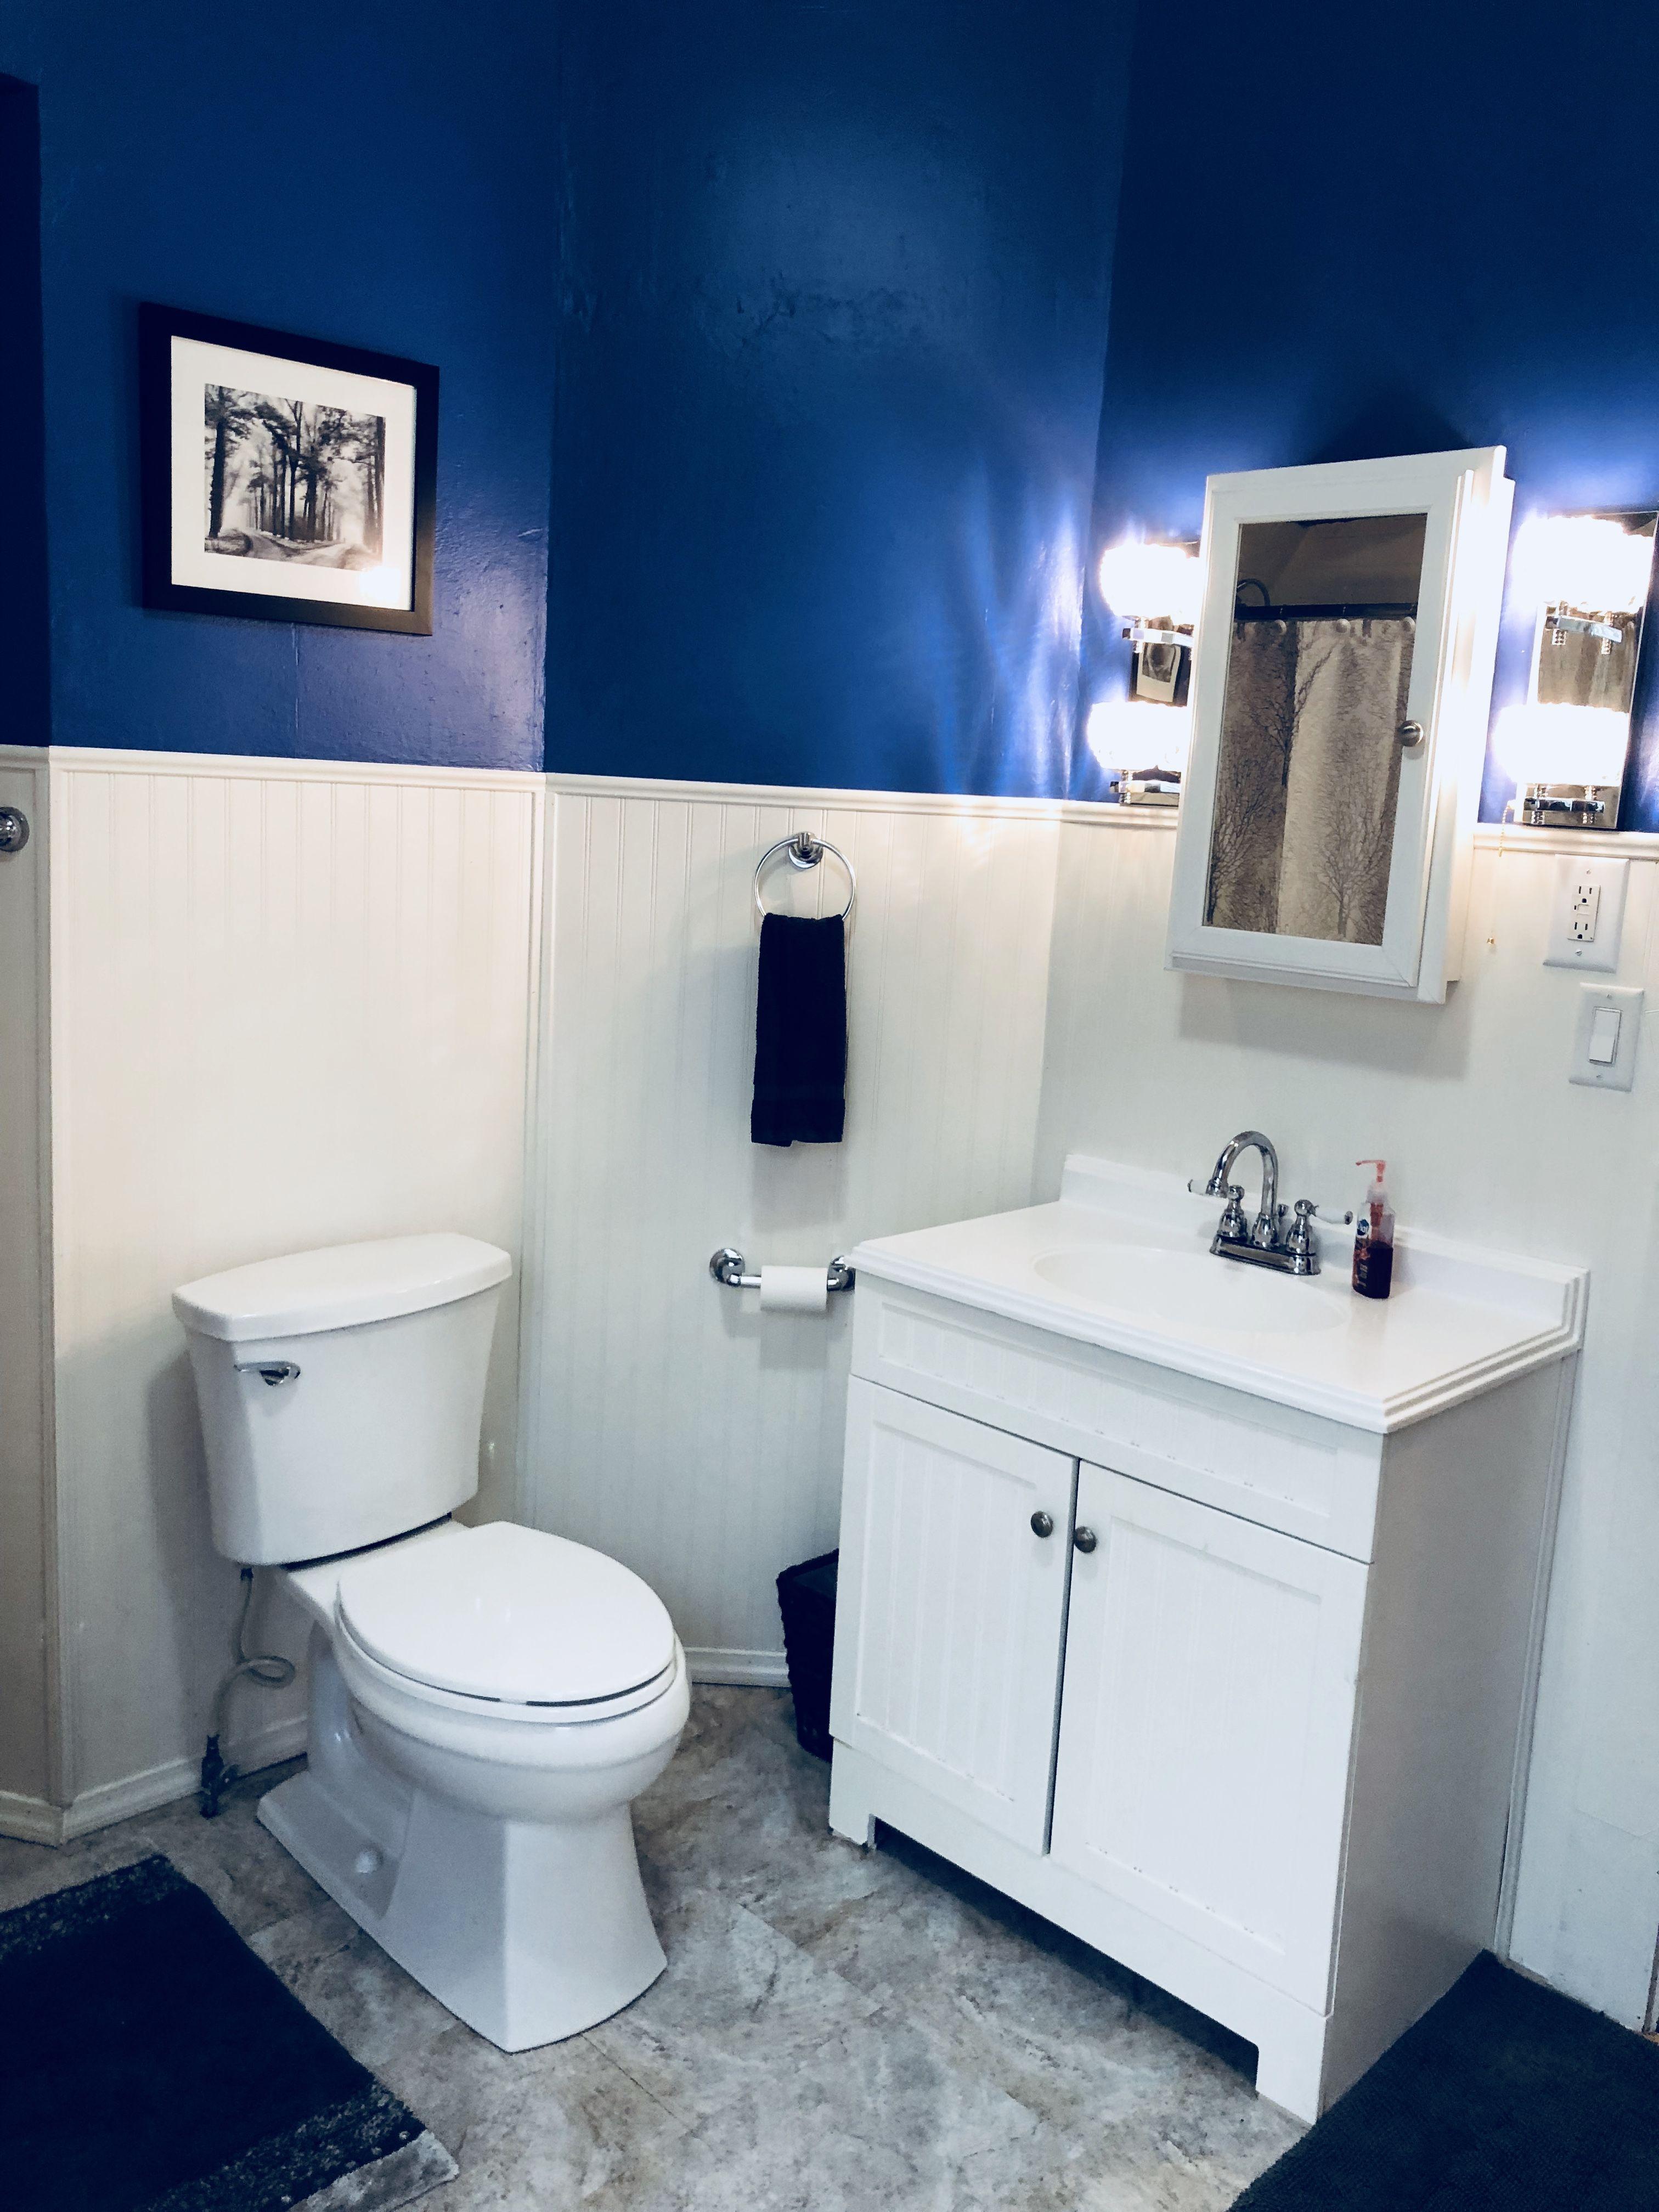 Pin By Lindsay Jobe On Bathroom Remodel Blue Bathroom Furniture Blue Bathroom Decor Yellow Bathroom Decor